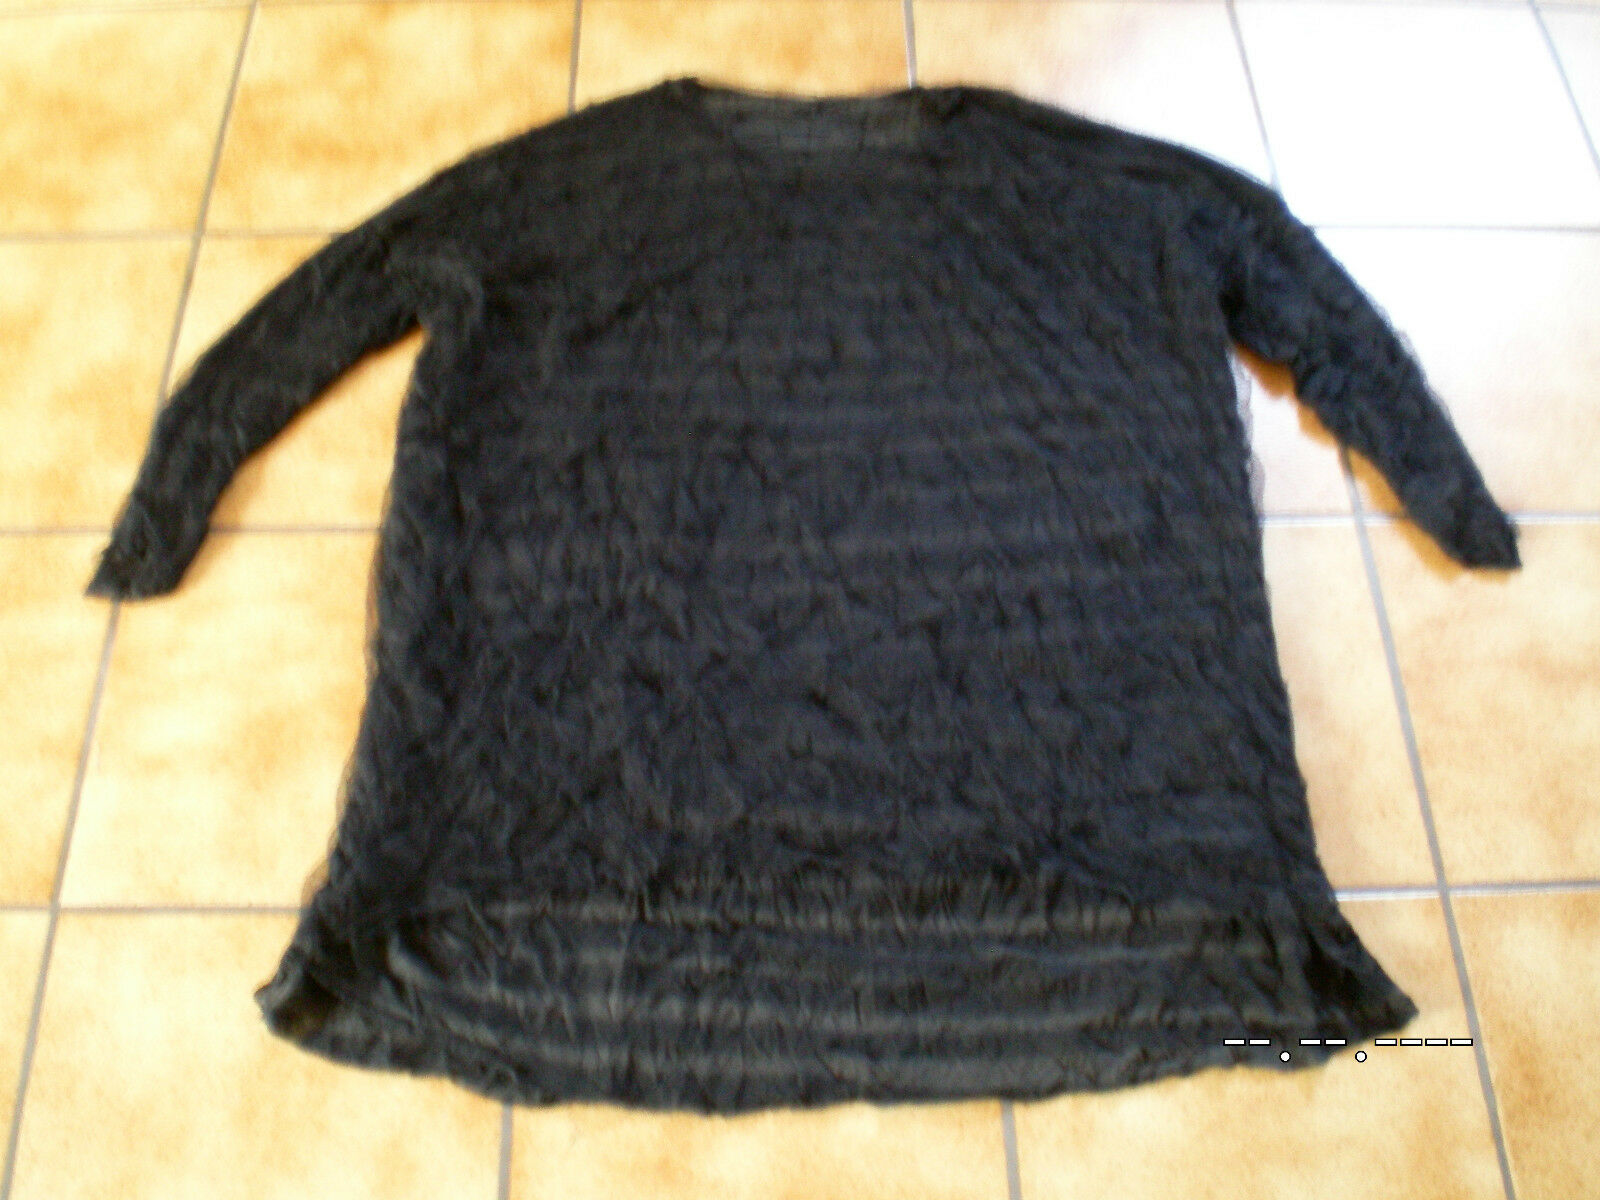 Rundholz schwarz Label,Tunika BIGShirt Shirt,Crash,plati.gestreift,Gr.OS,Lagenlook